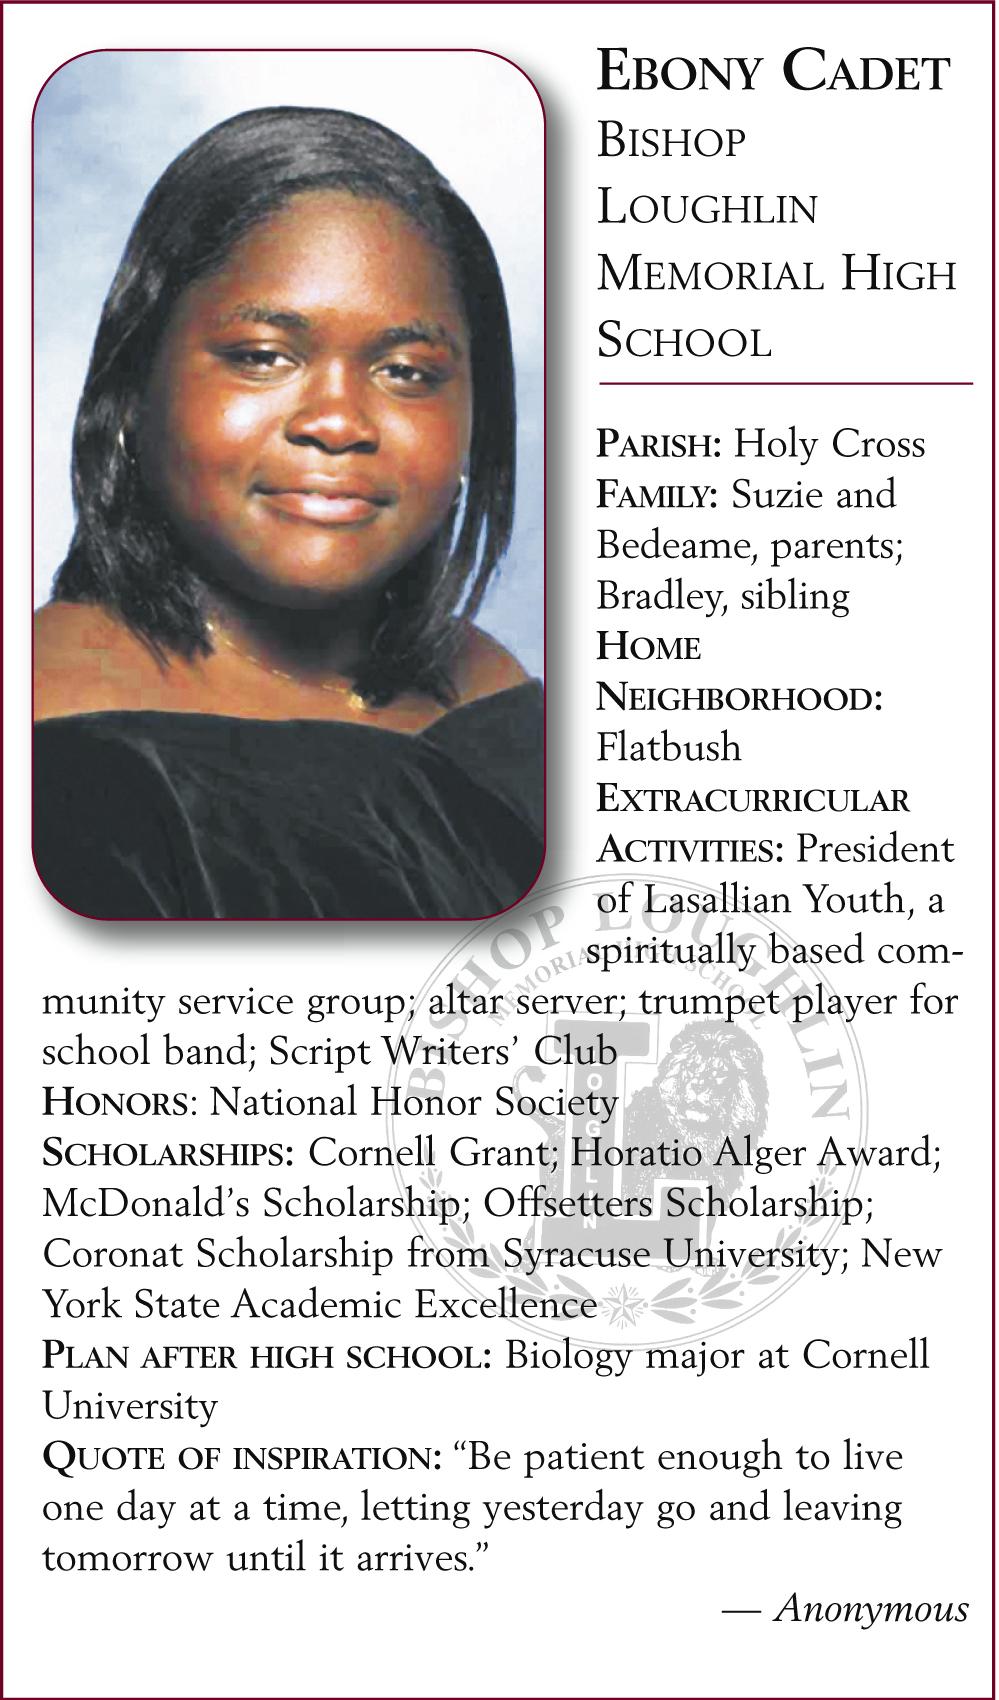 Ebony Cadet, Bishop Loughlin Memorial High School